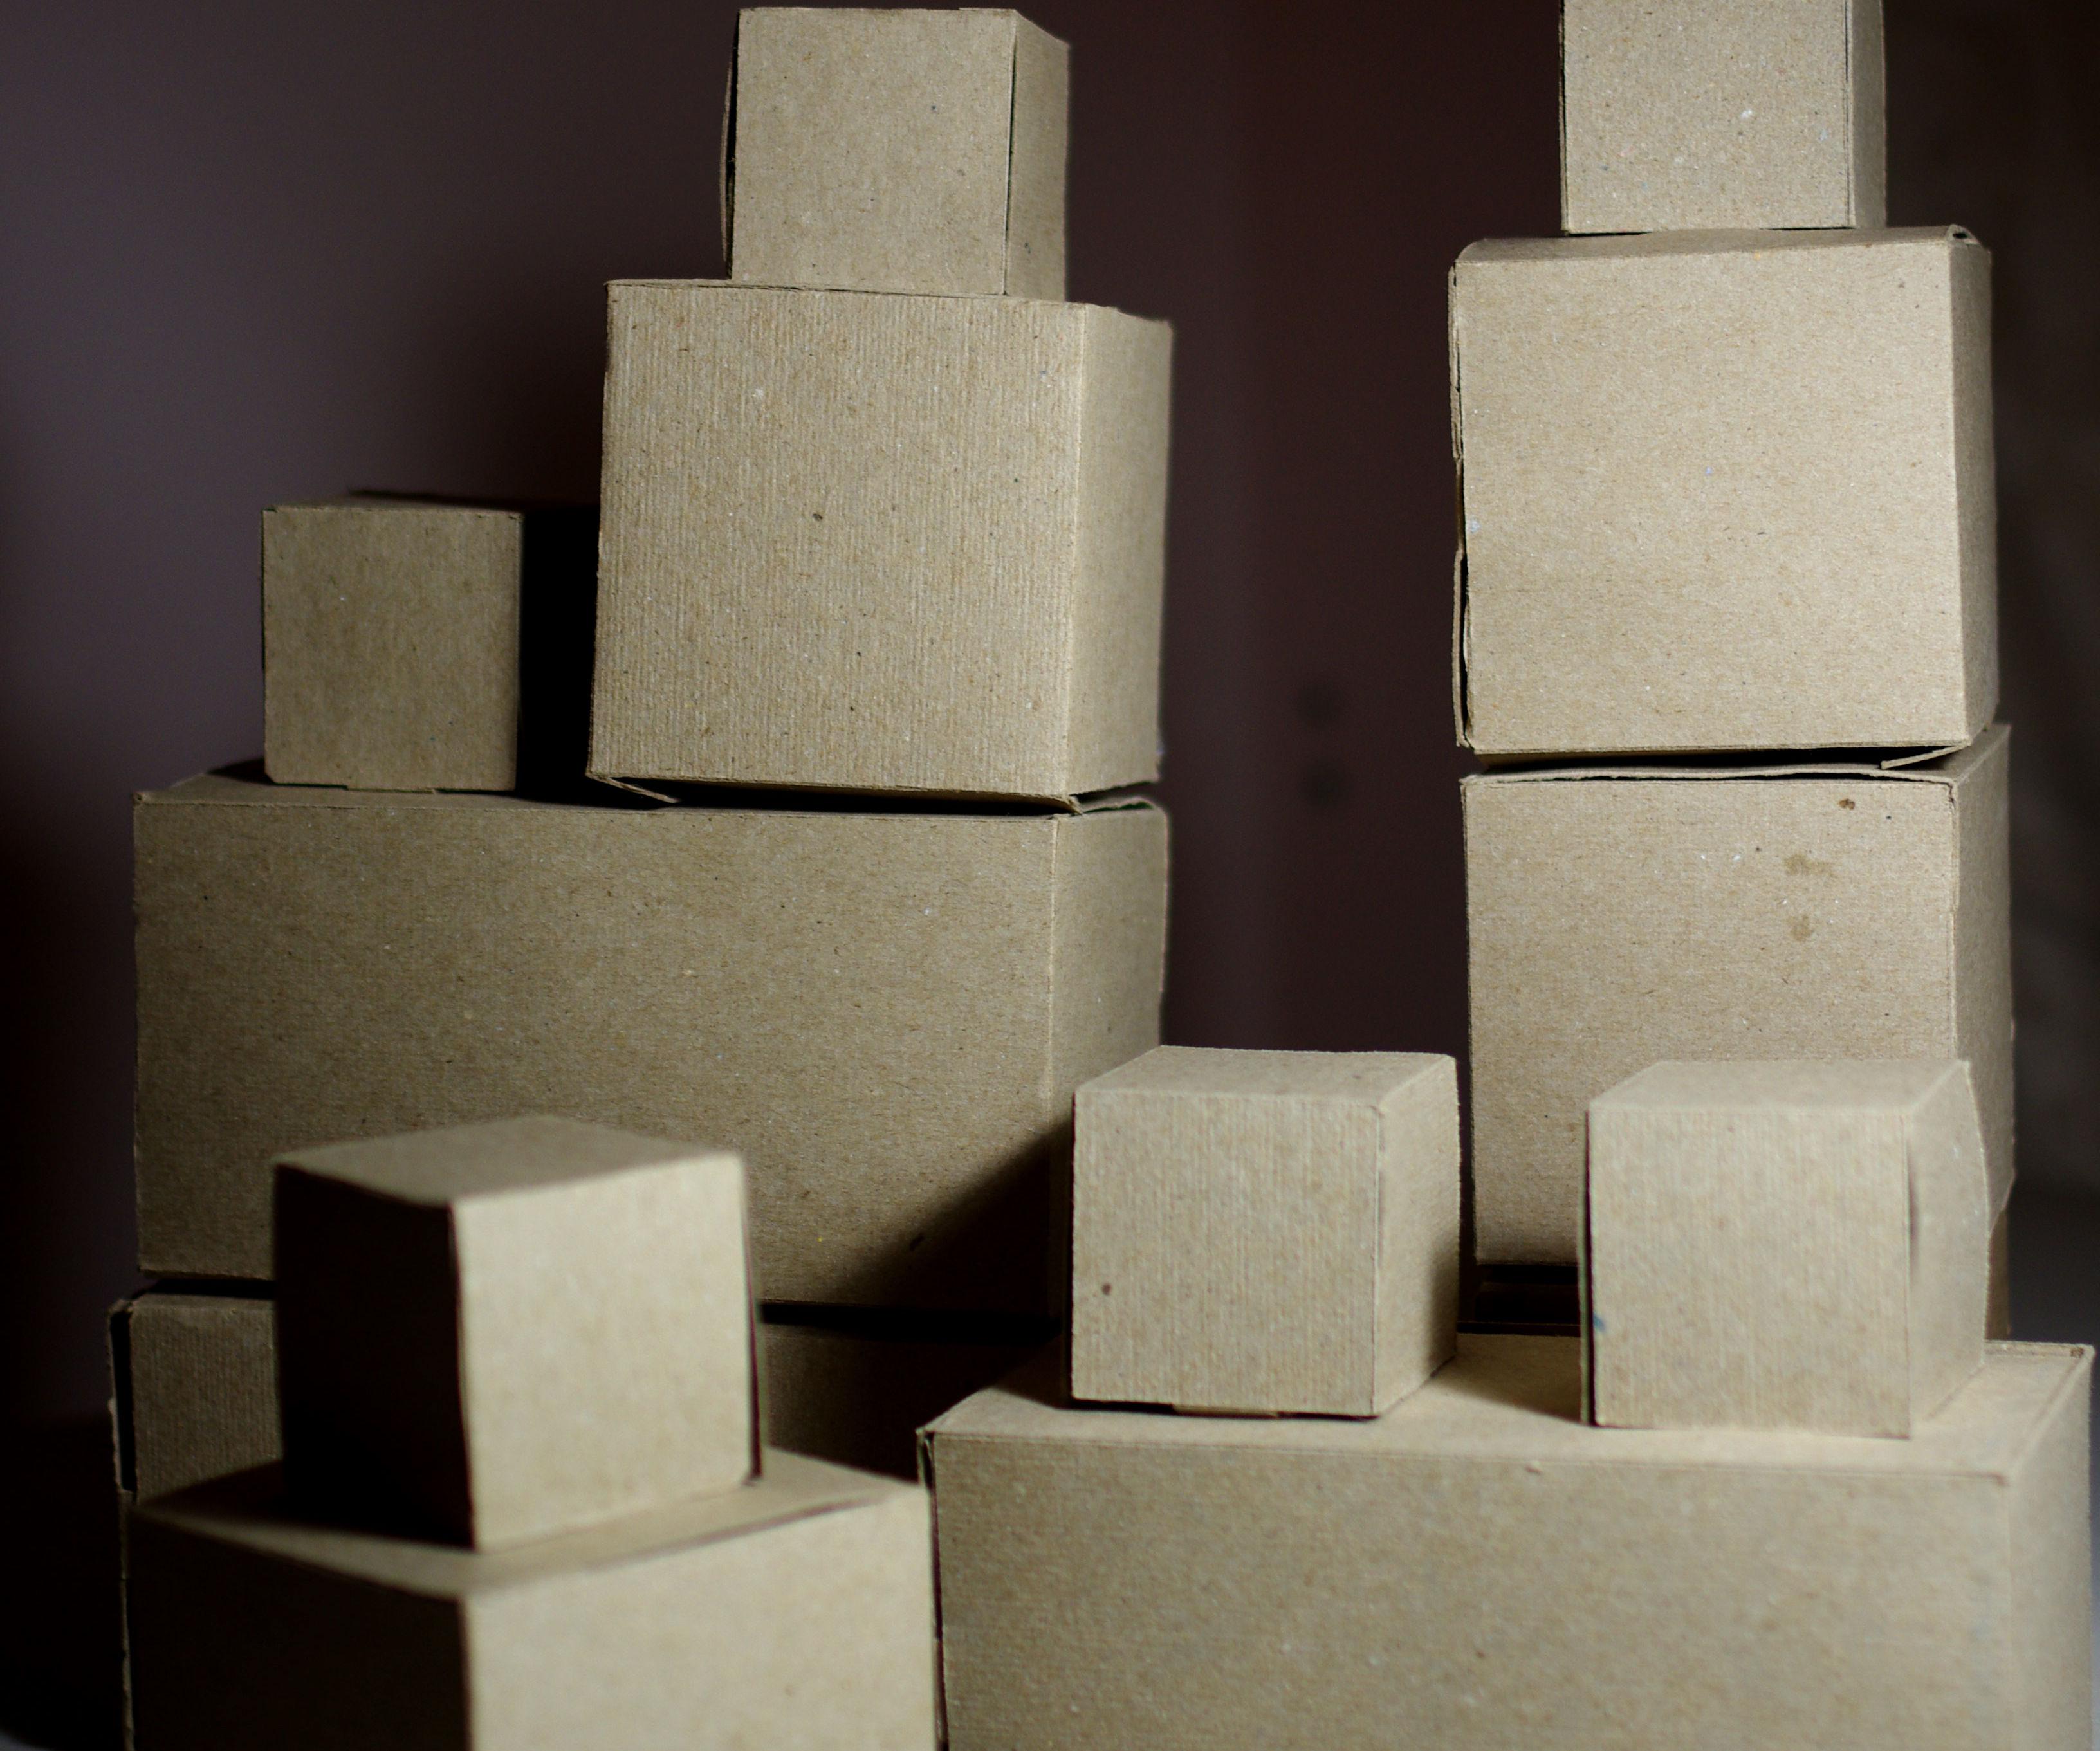 Giant Cardboard Blocks